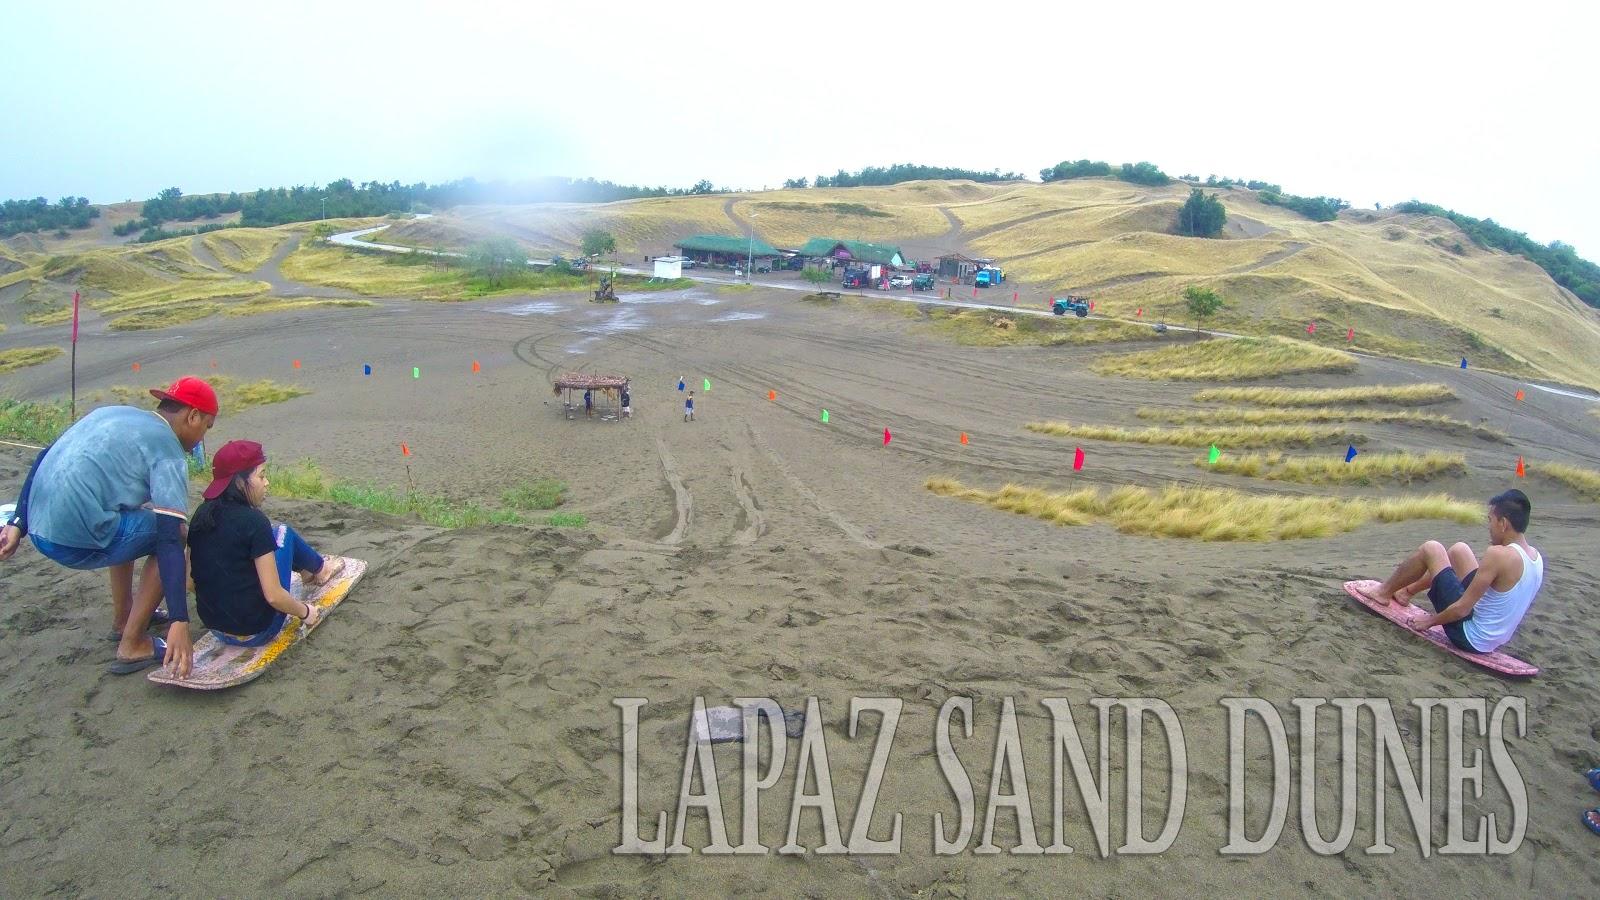 Lapaz Sand Dunes